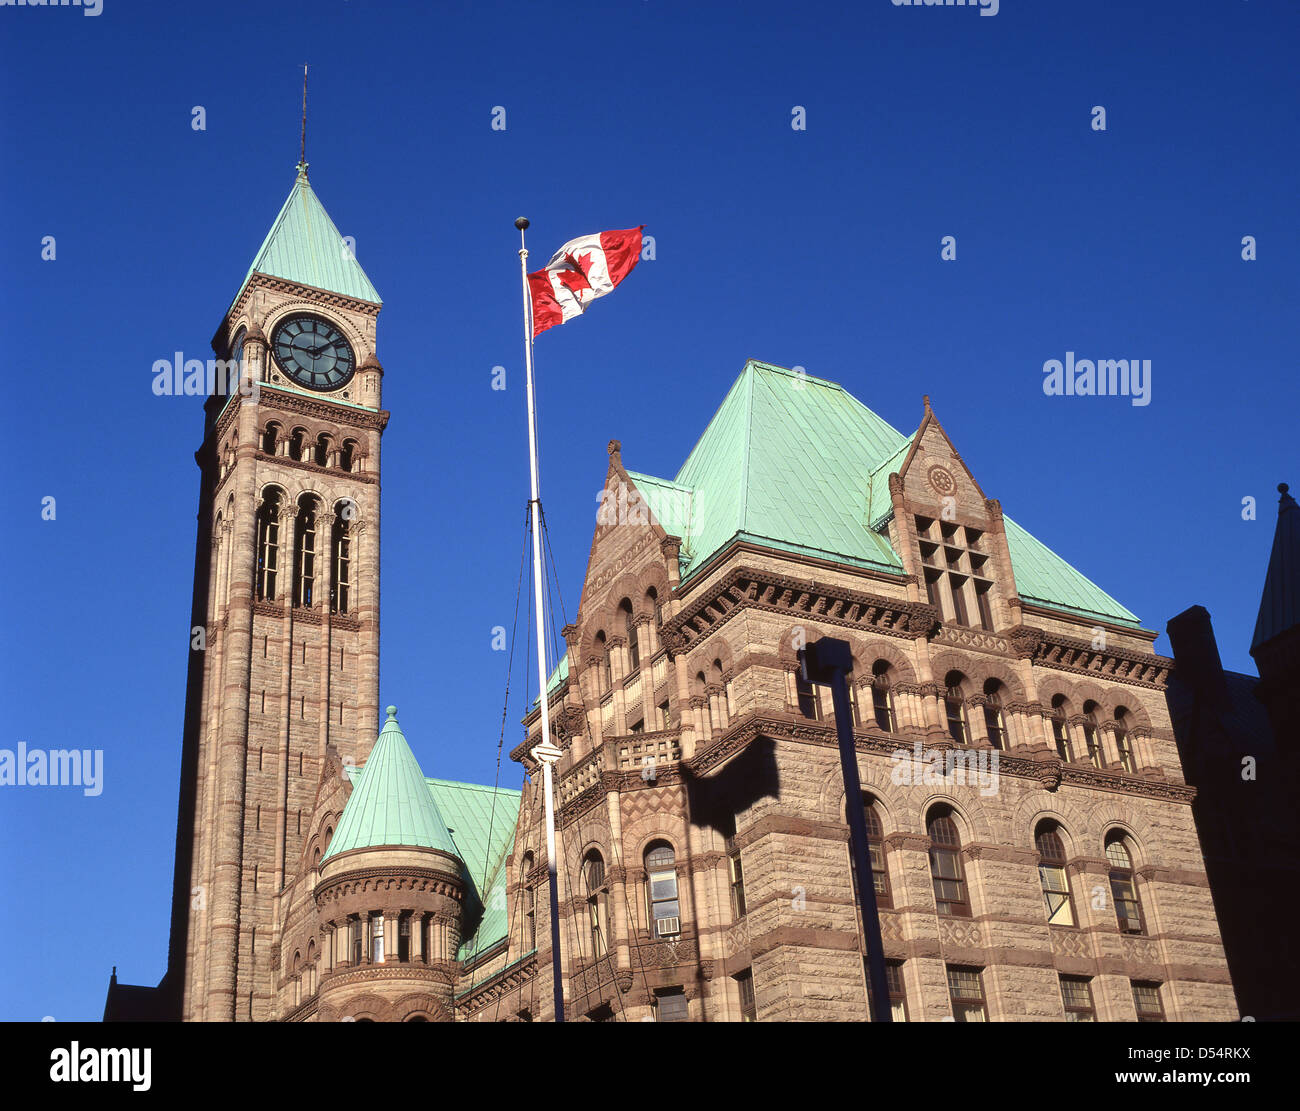 Der Centre Block (Édifice du Centre), Parliament Hill, Ottawa, National Capital Region, Provinz Ontario, Kanada Stockbild